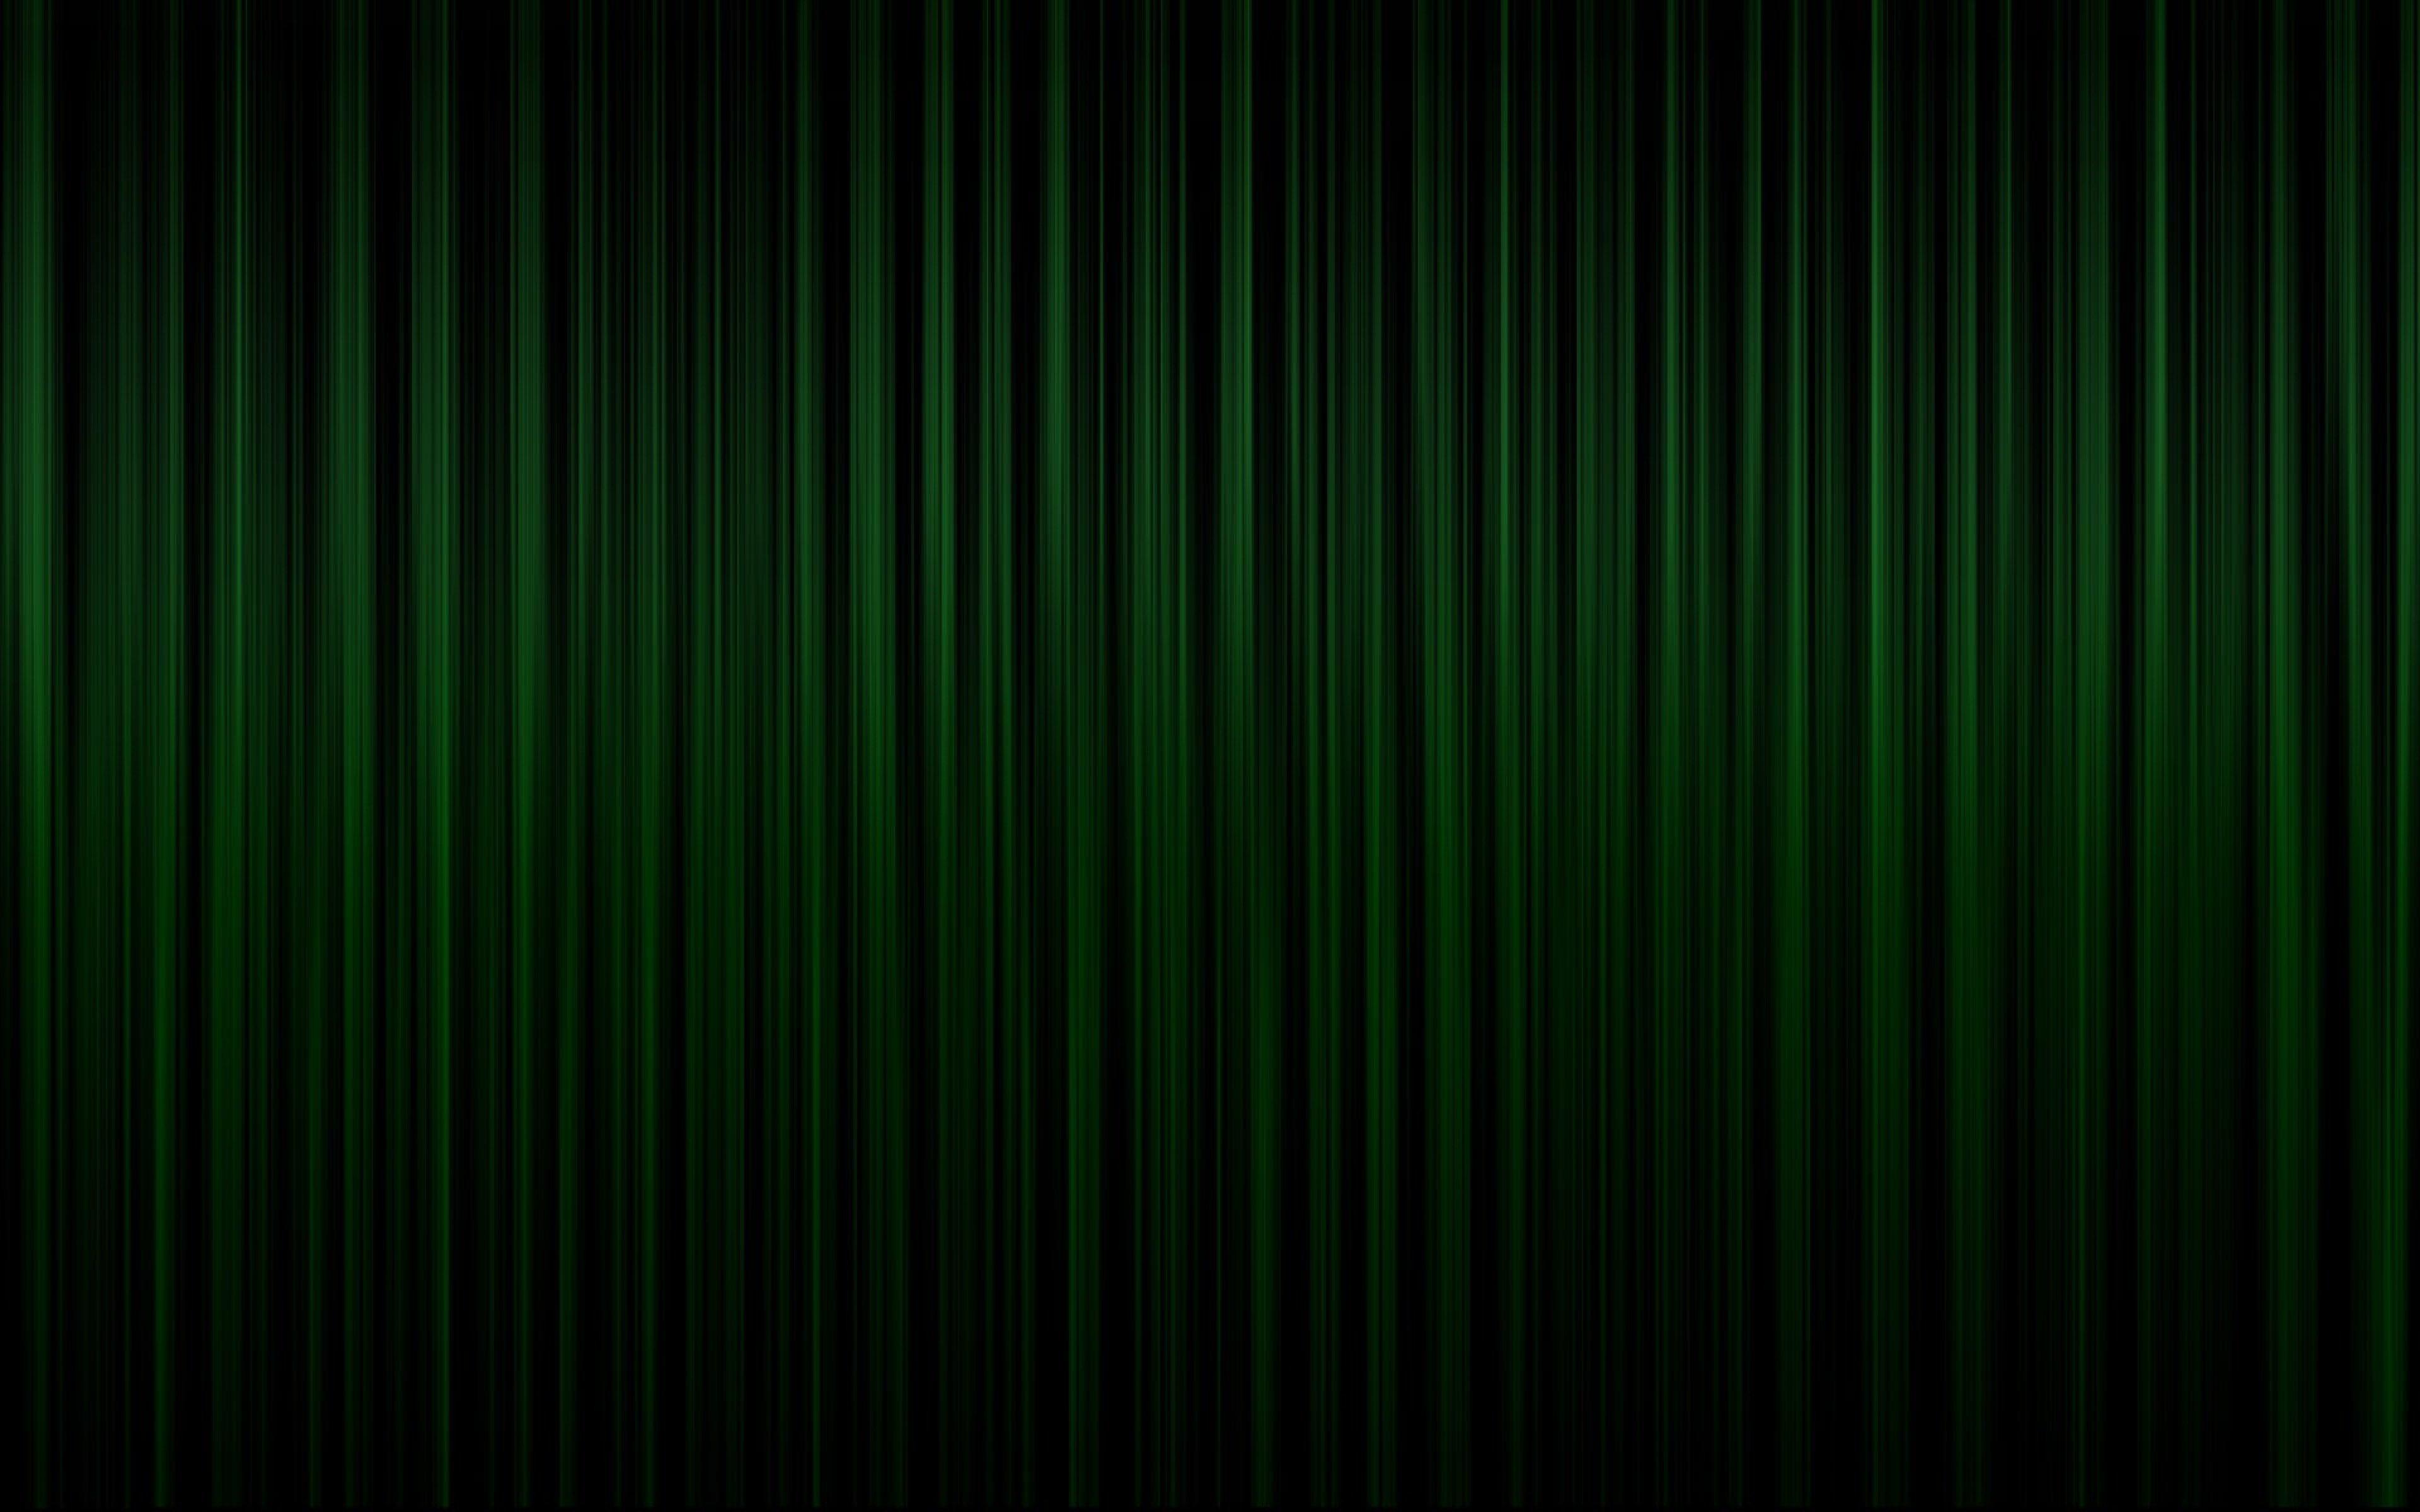 dark vertical 4k green shadow texture hd wallpapers background ultra lines bands wallpapersafari desktop screen wallhere